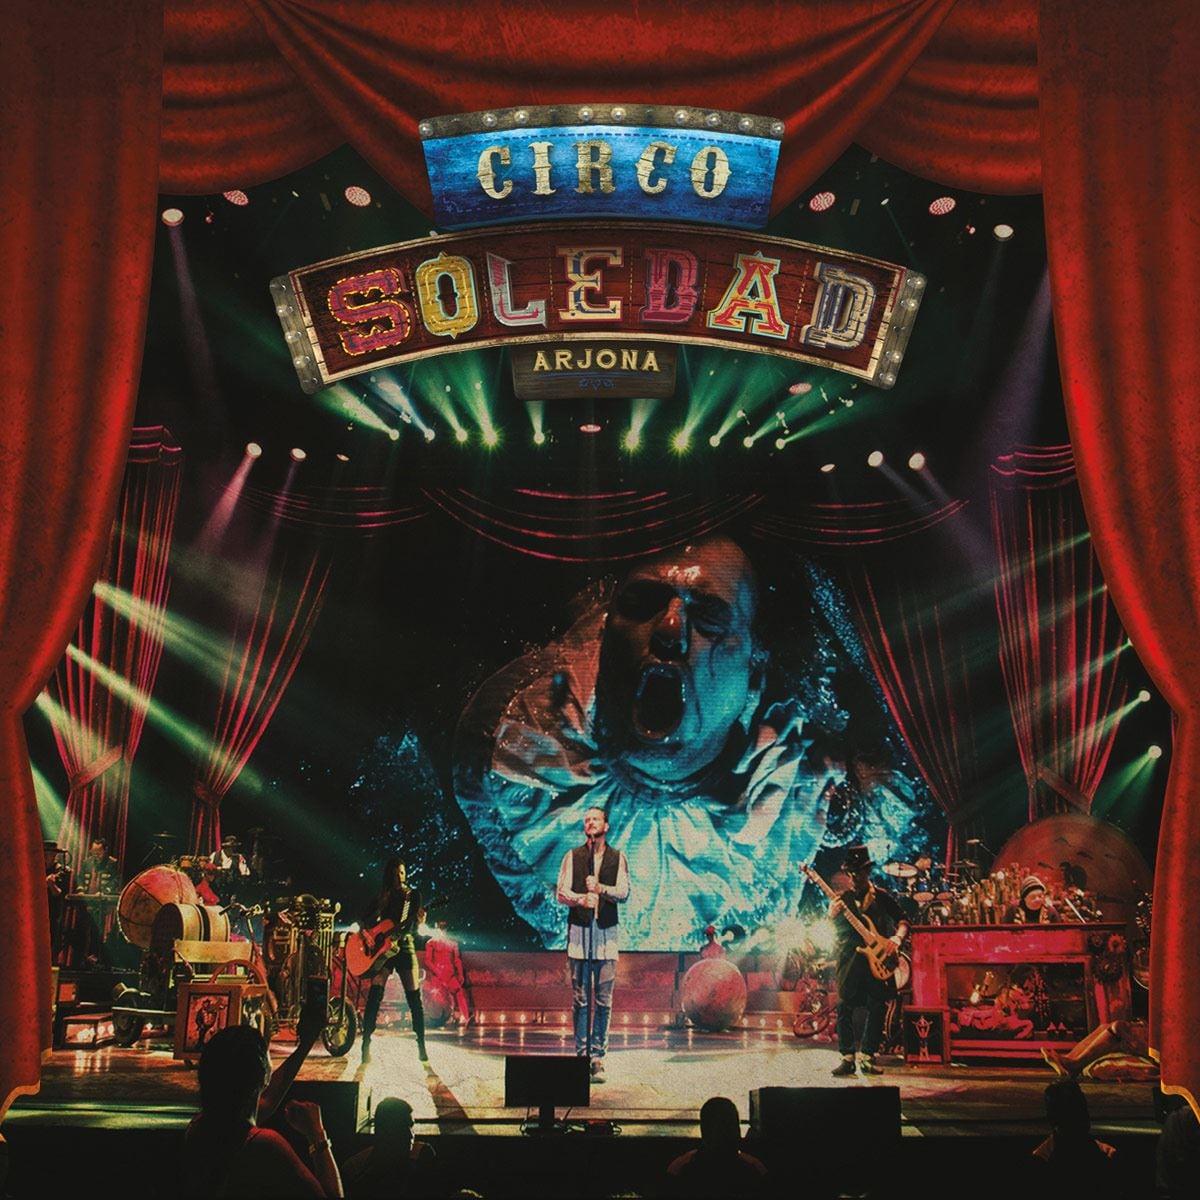 CD2 + DVD Ricardo Arjona - Circo Soledad